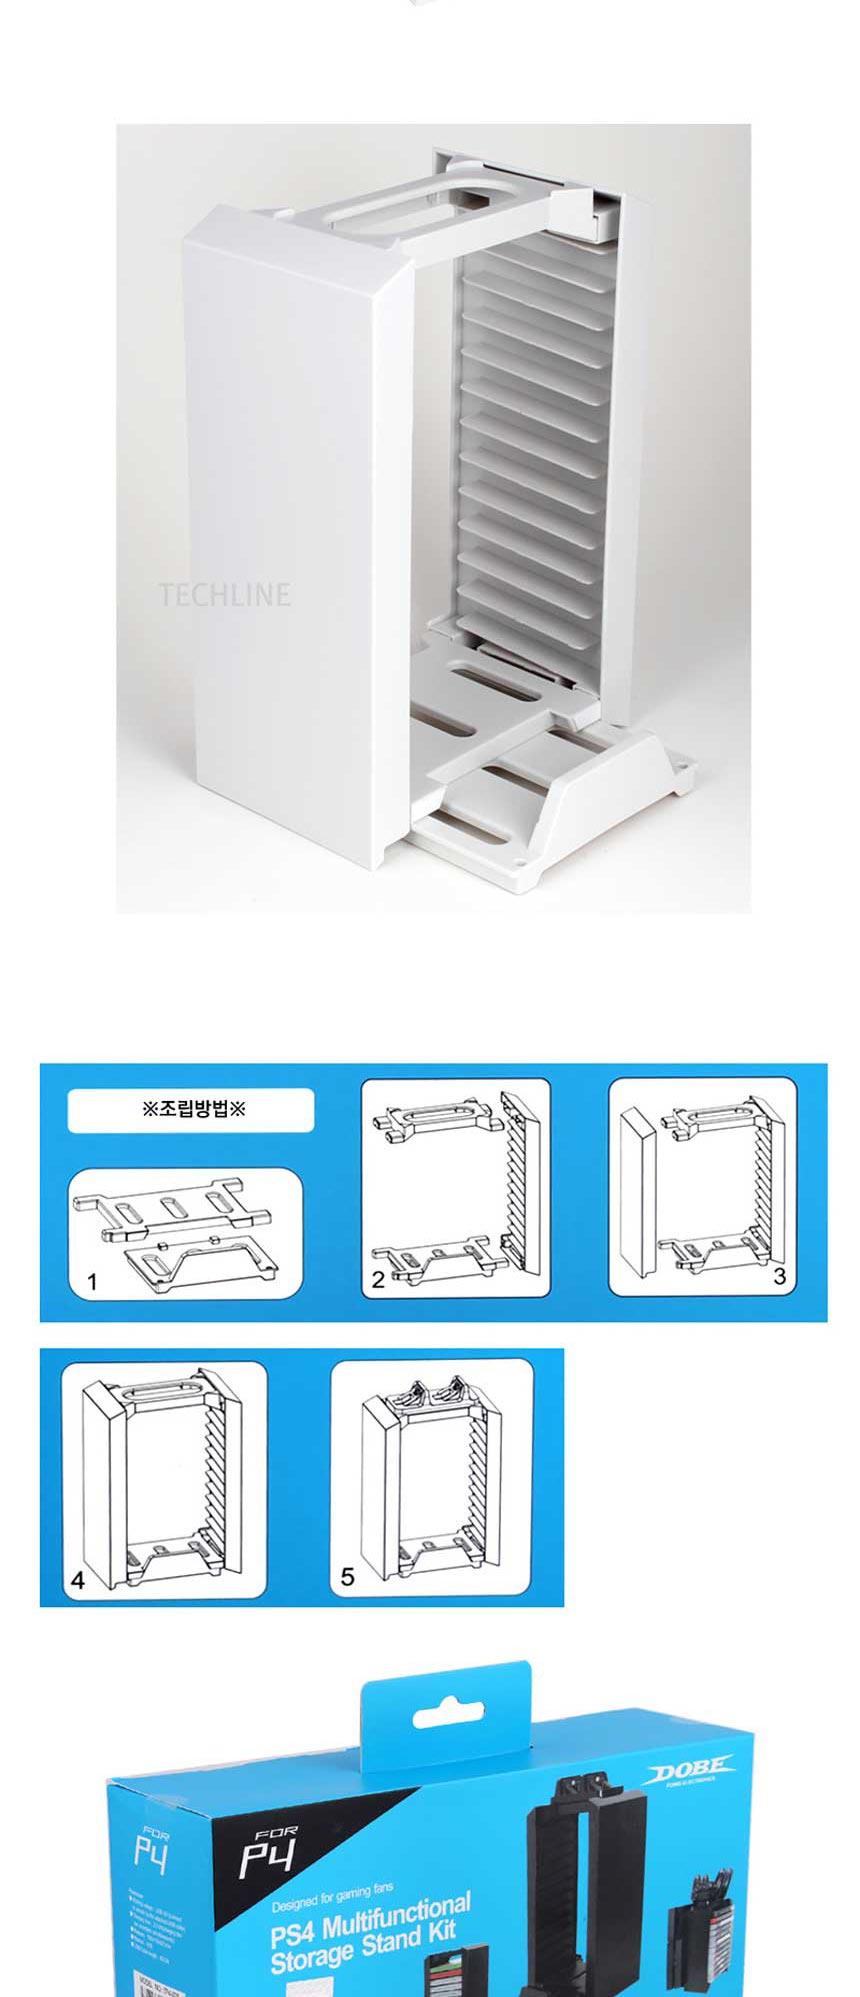 Ps4 Multifunctional Multi Lamps Hardwood Dressers Title Storage Stand Kit Seller Information